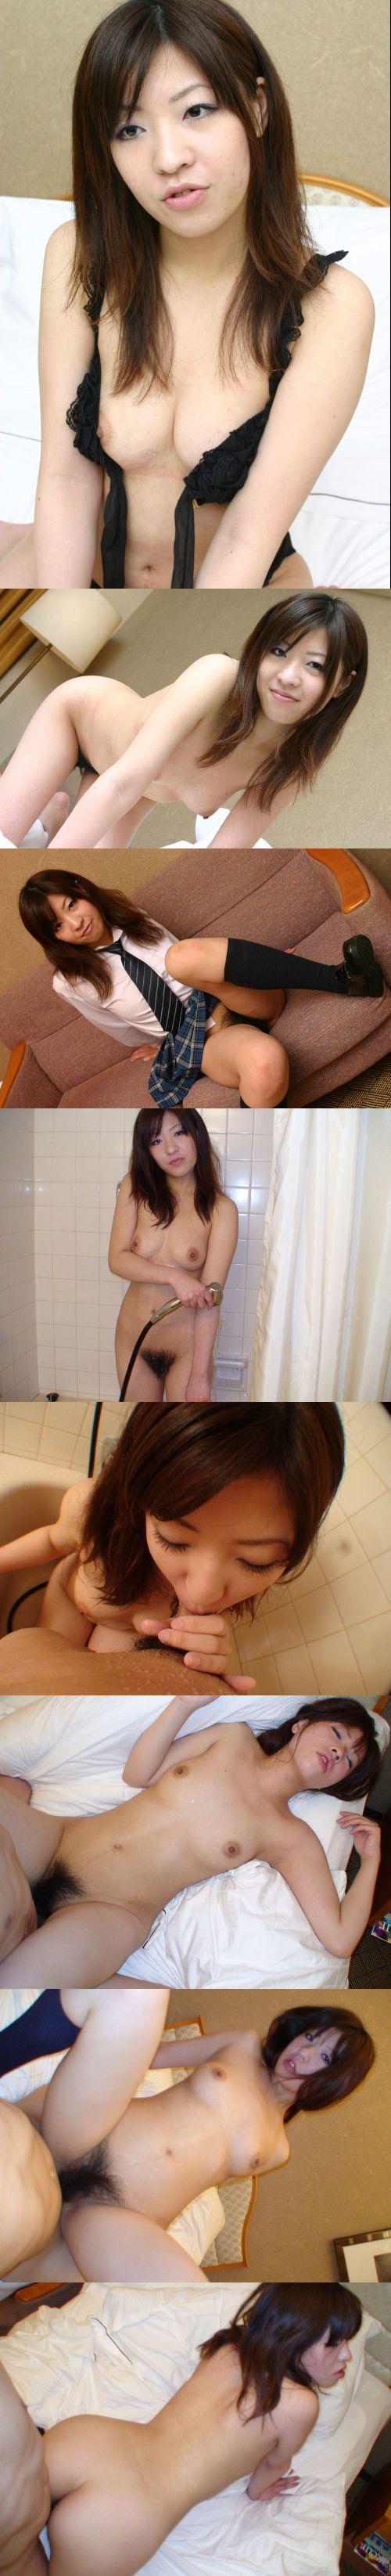 Japabeauty Sara Minami 南沙良 19才 - image 121 on https://javfree.me